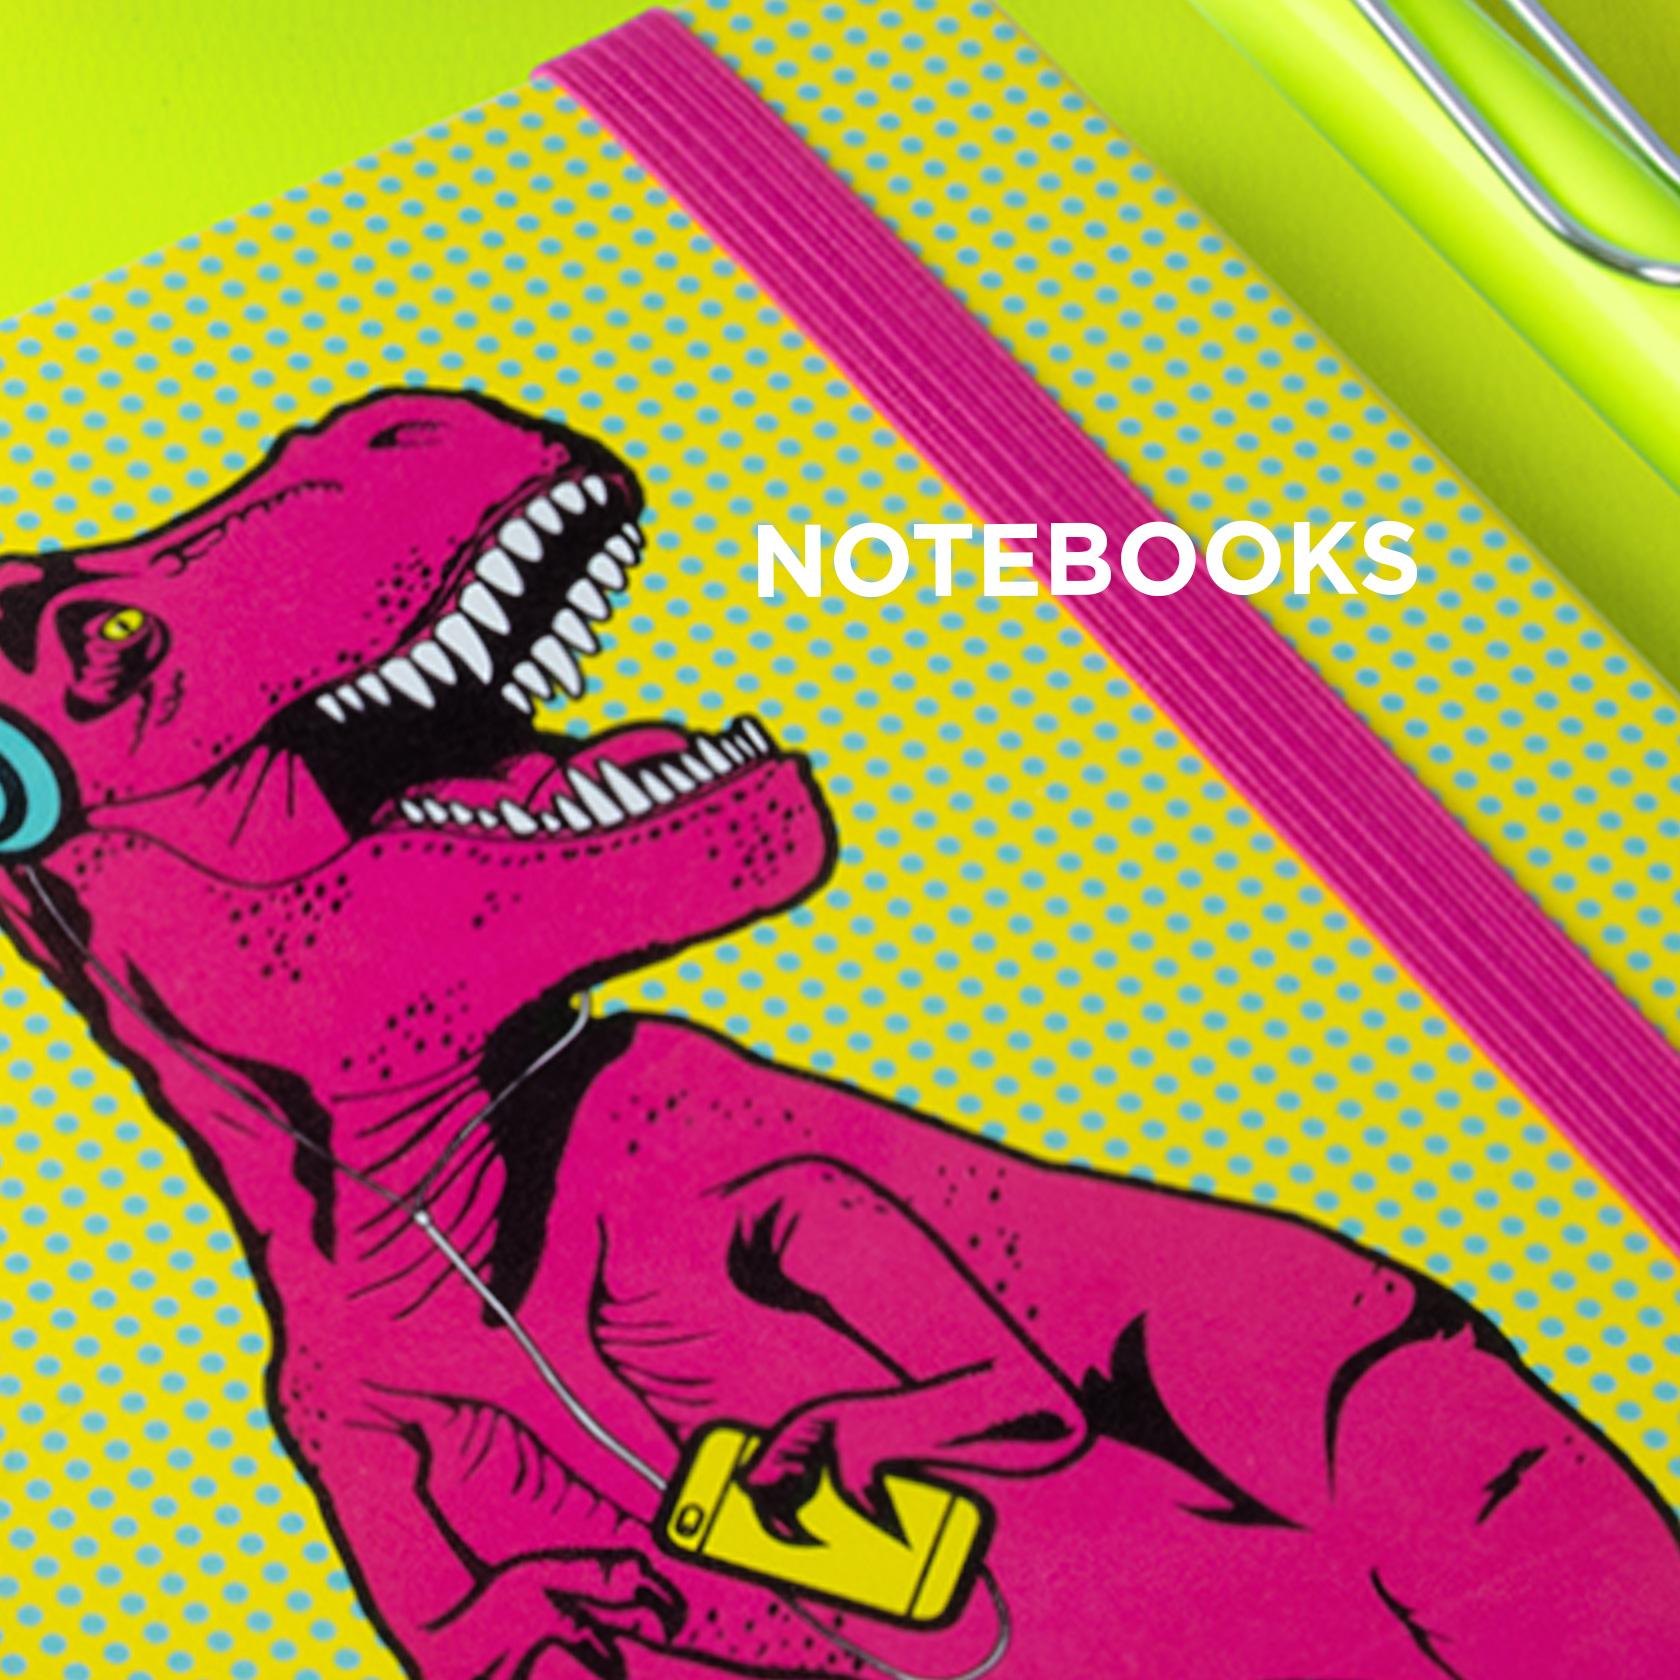 T-Rex notebooks from justmustard.com